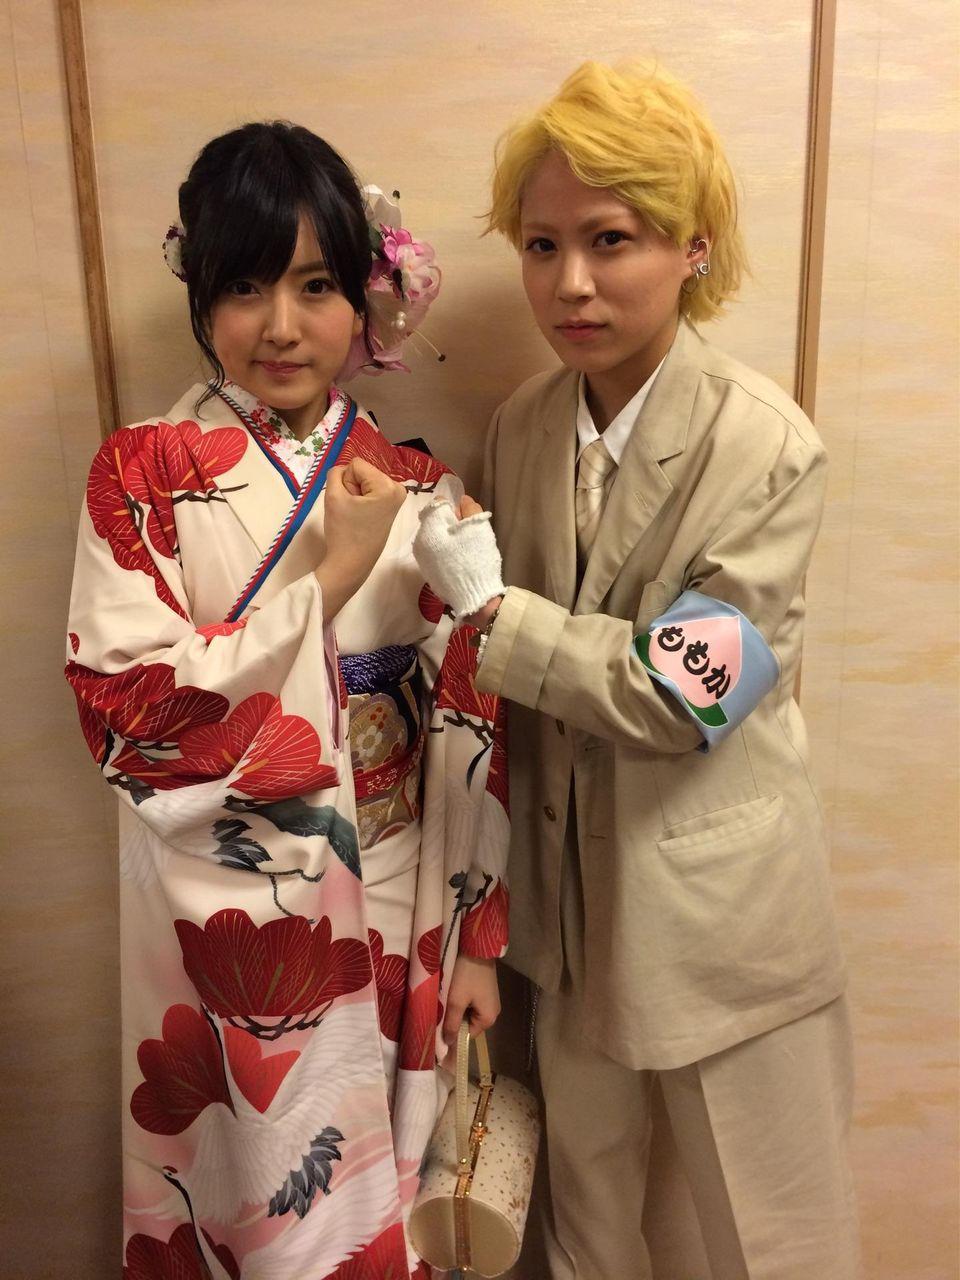 【AKB48グループ成人式】木下百花は国鉄車掌服で参加。NMB48メンバー画像